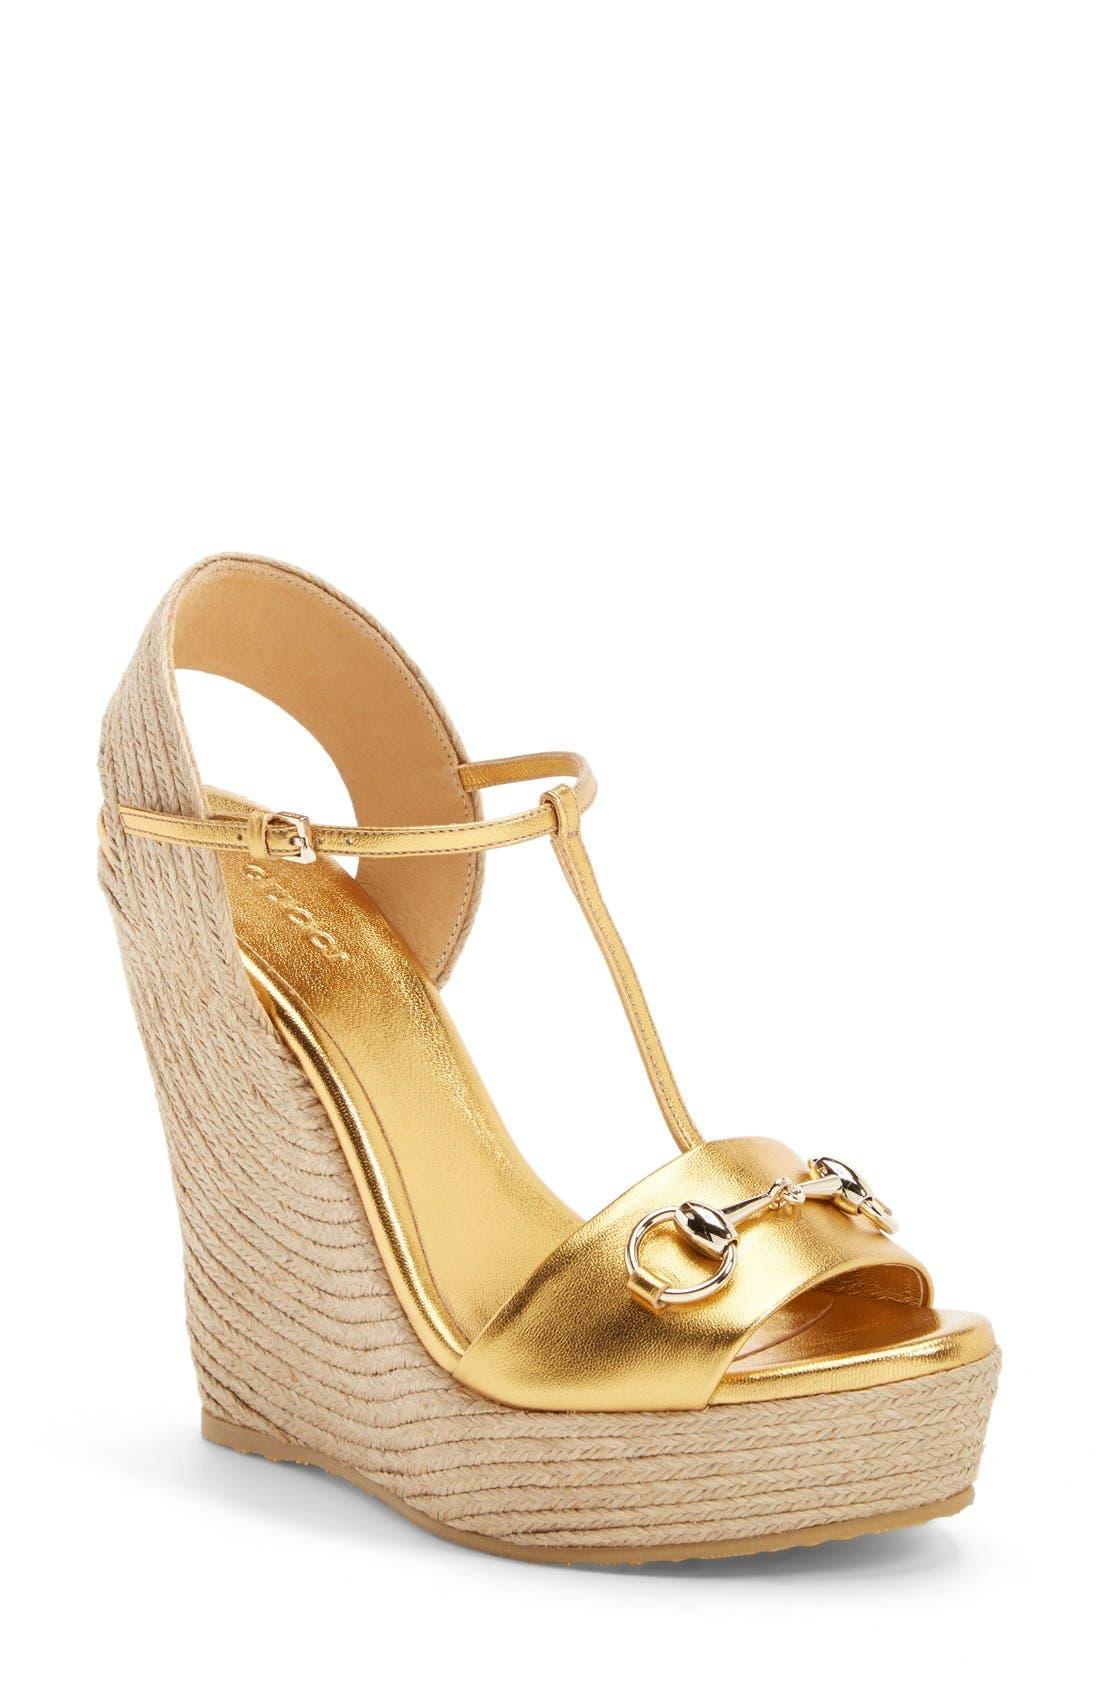 Alternate Image 1 Selected - Gucci 'Rafia' T-Strap Wedge Sandal (Women)